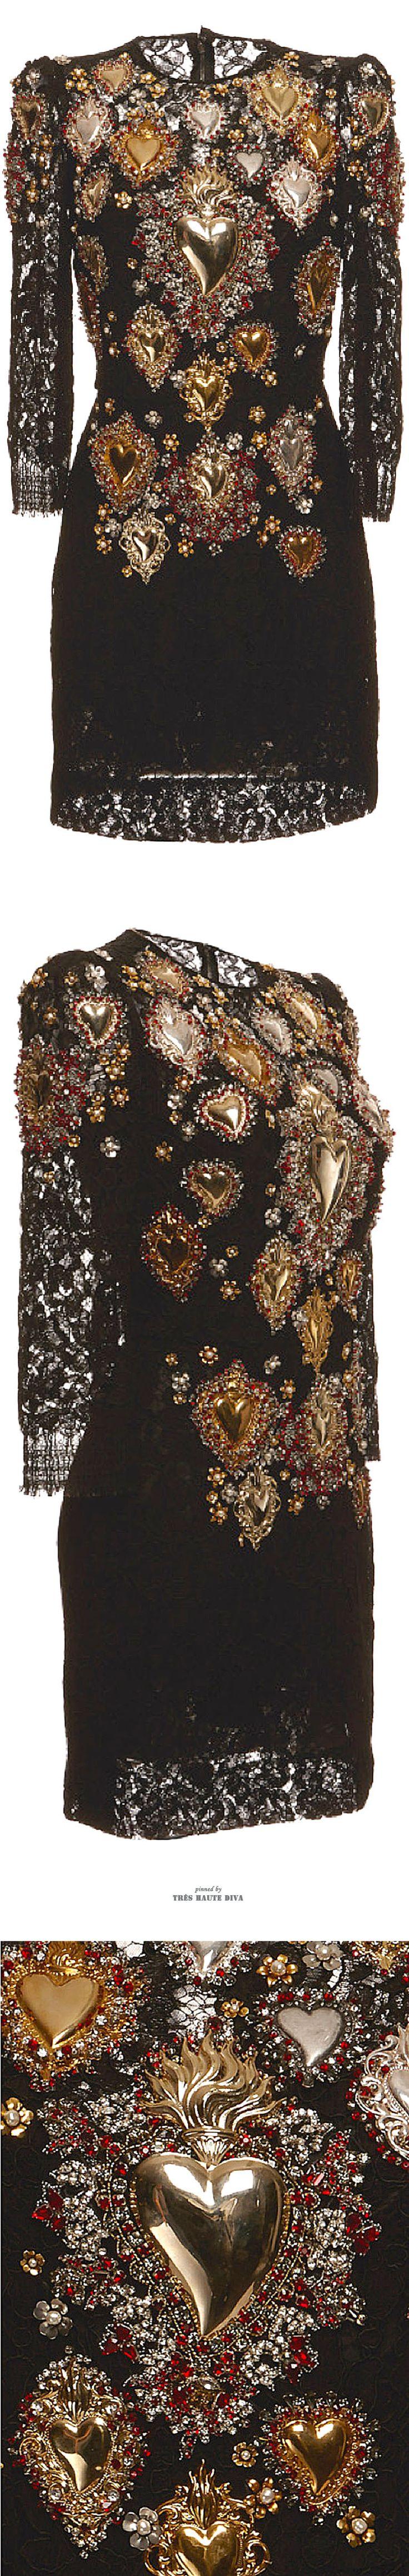 Dolce & Gabbana Sacred Heart Embellished Lace Shift Dress SS 2015